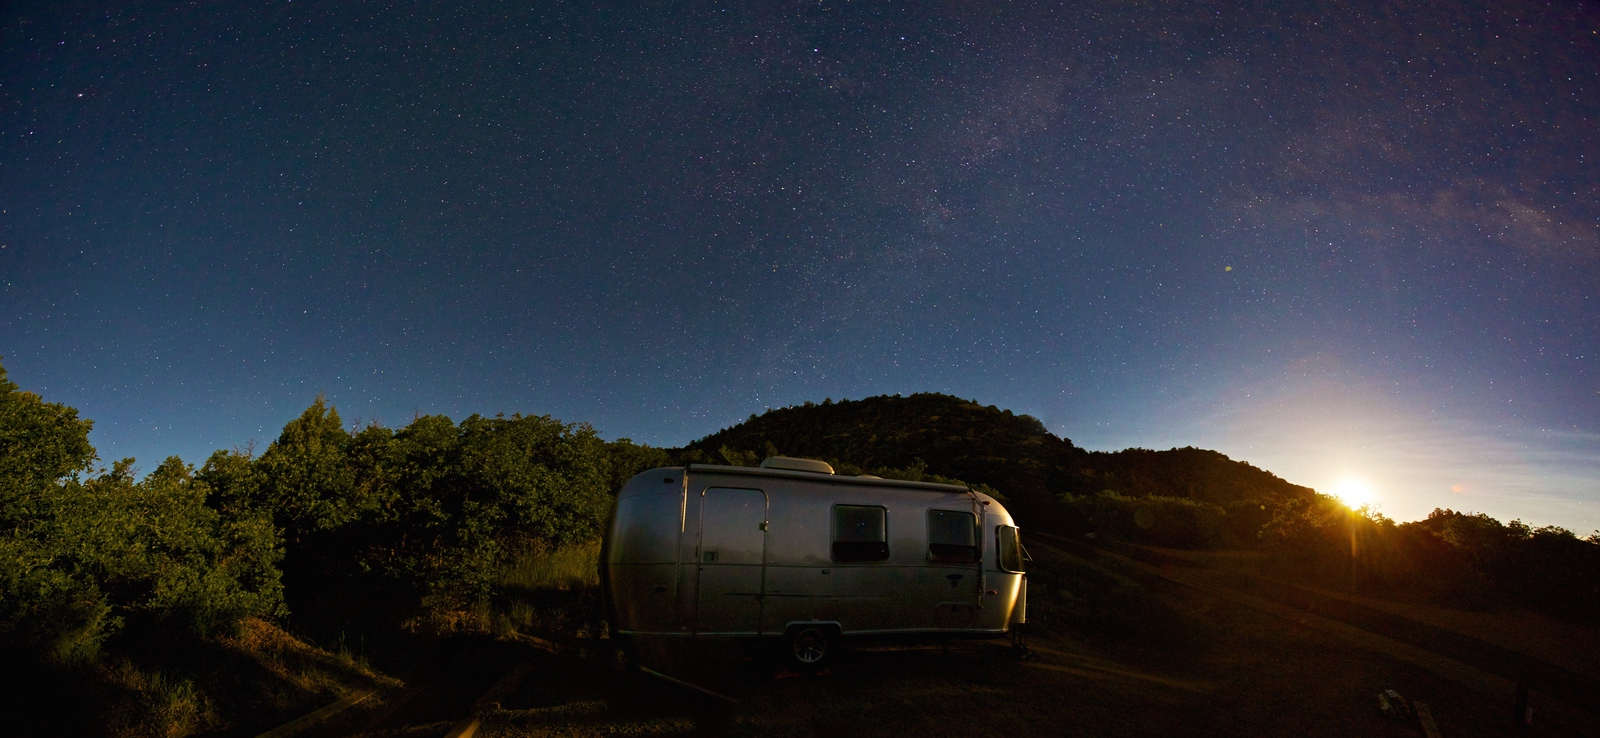 Moonrise and Airstream